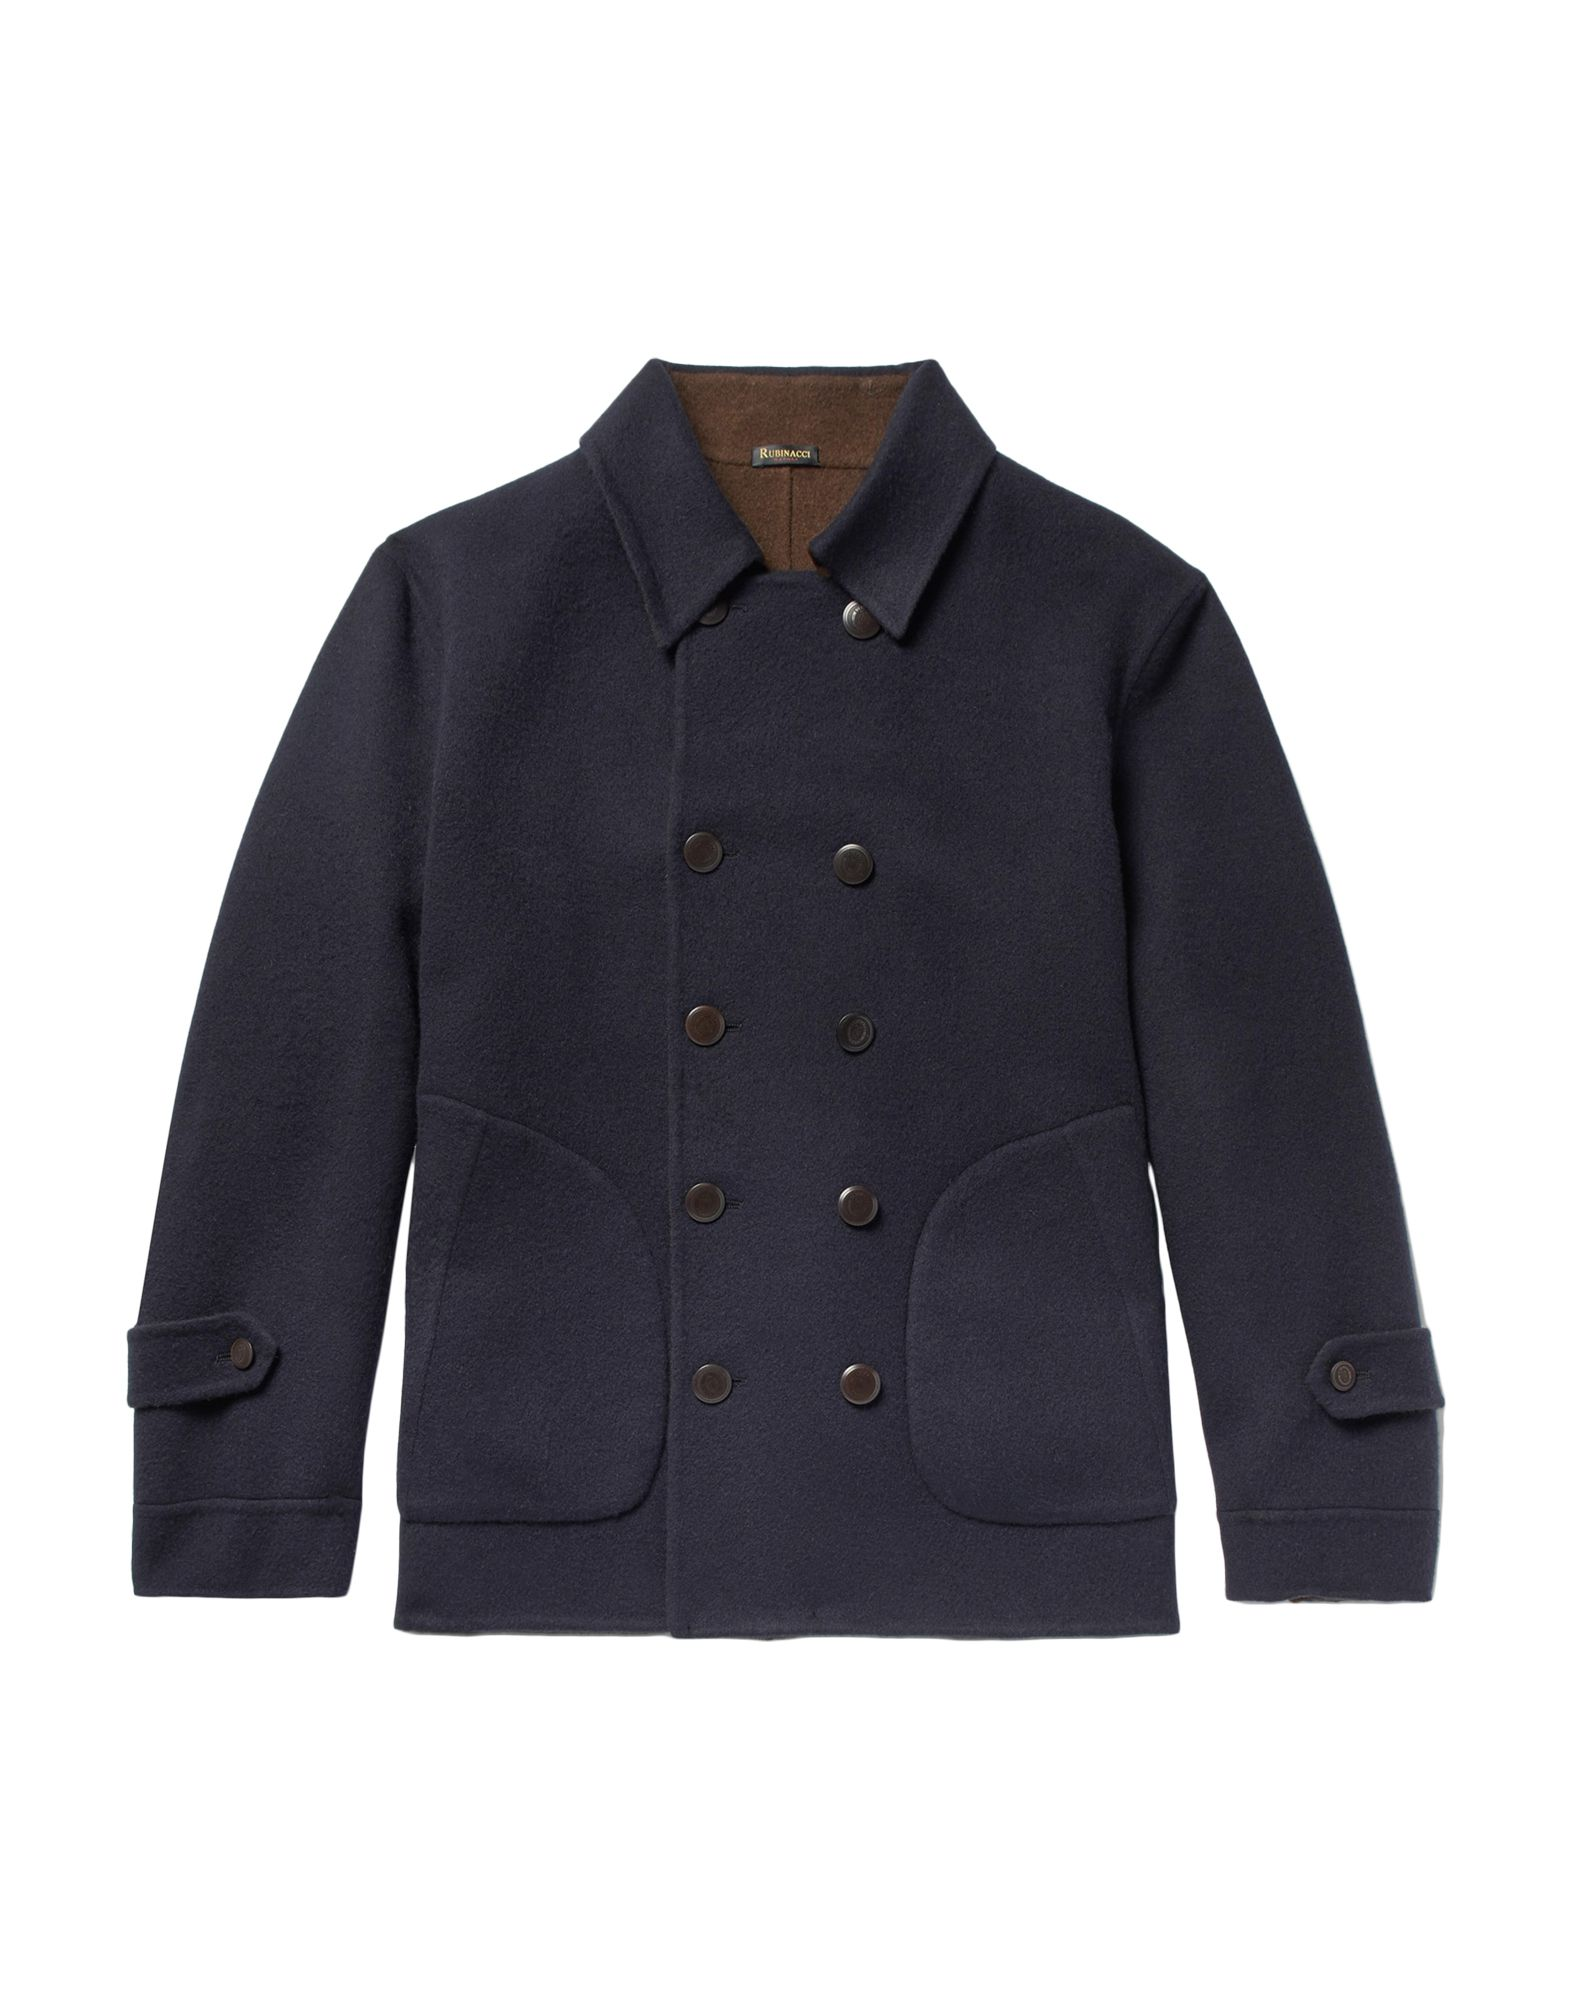 MARIANO RUBINACCI Легкое пальто mariano rubinacci пиджак